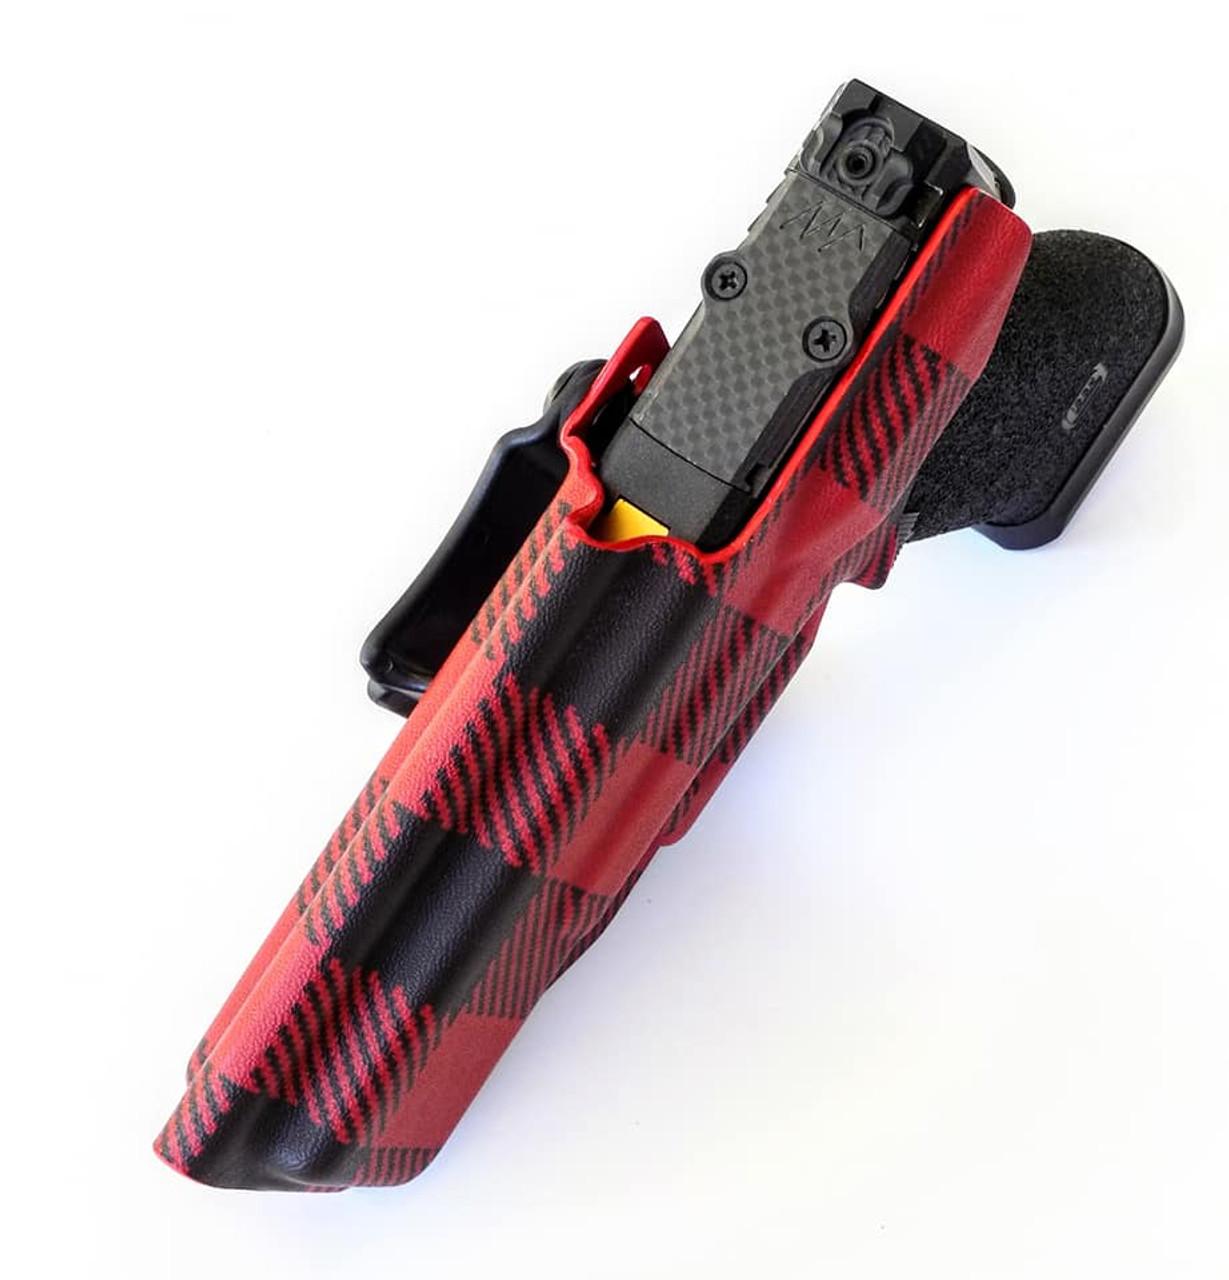 Glock 17 Appendix Carry Kydex Holster RMR Cut